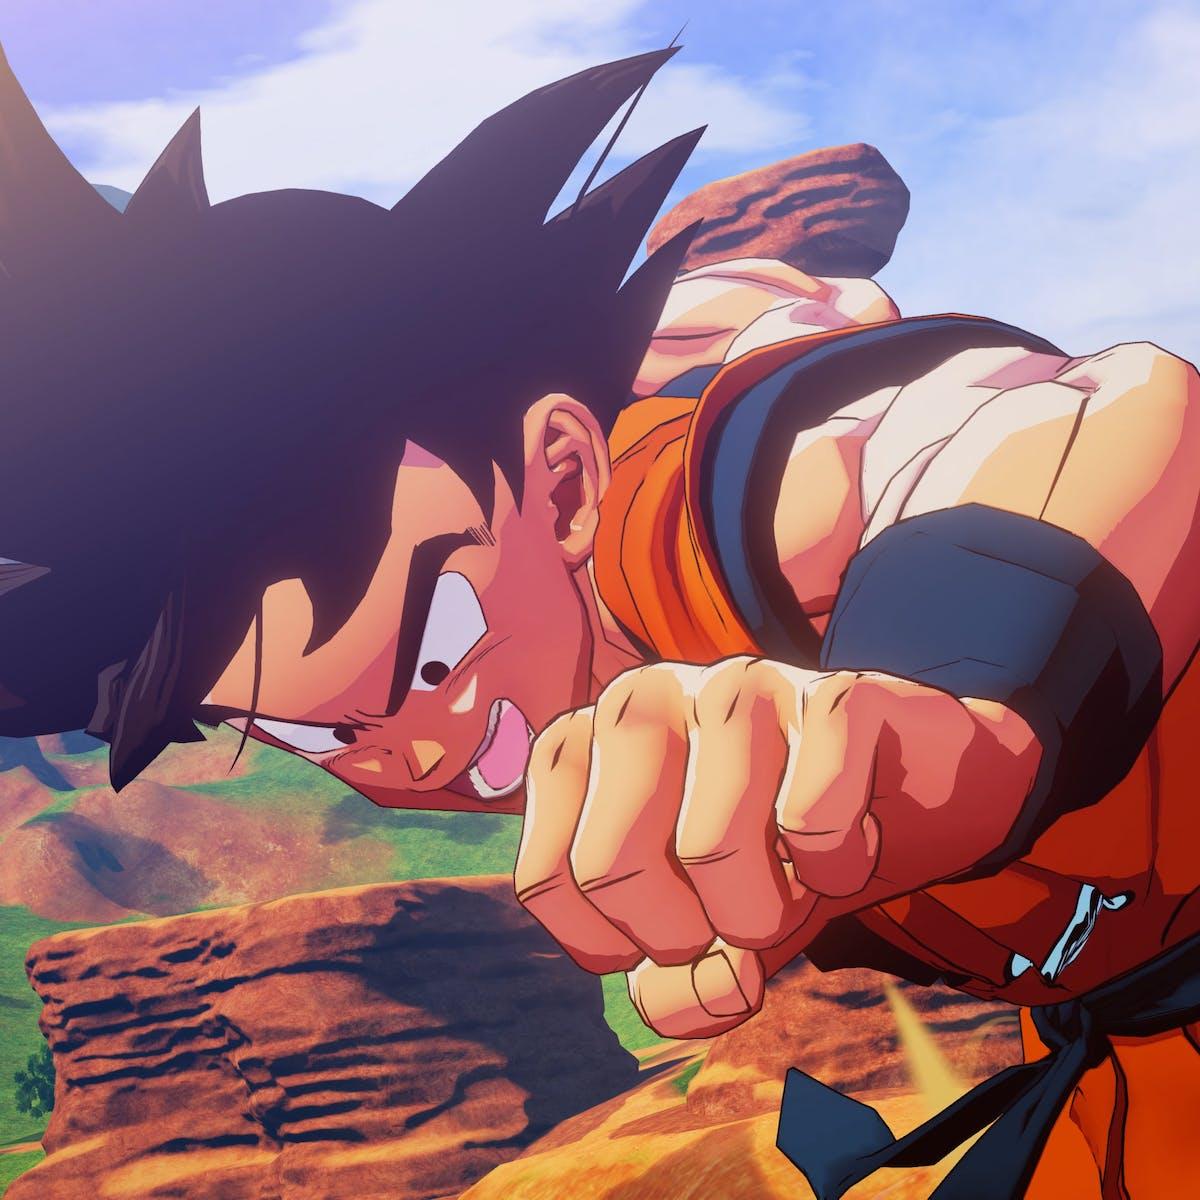 How to beat Raditz in 'Dragon Ball Z Kakarot's first boss battle